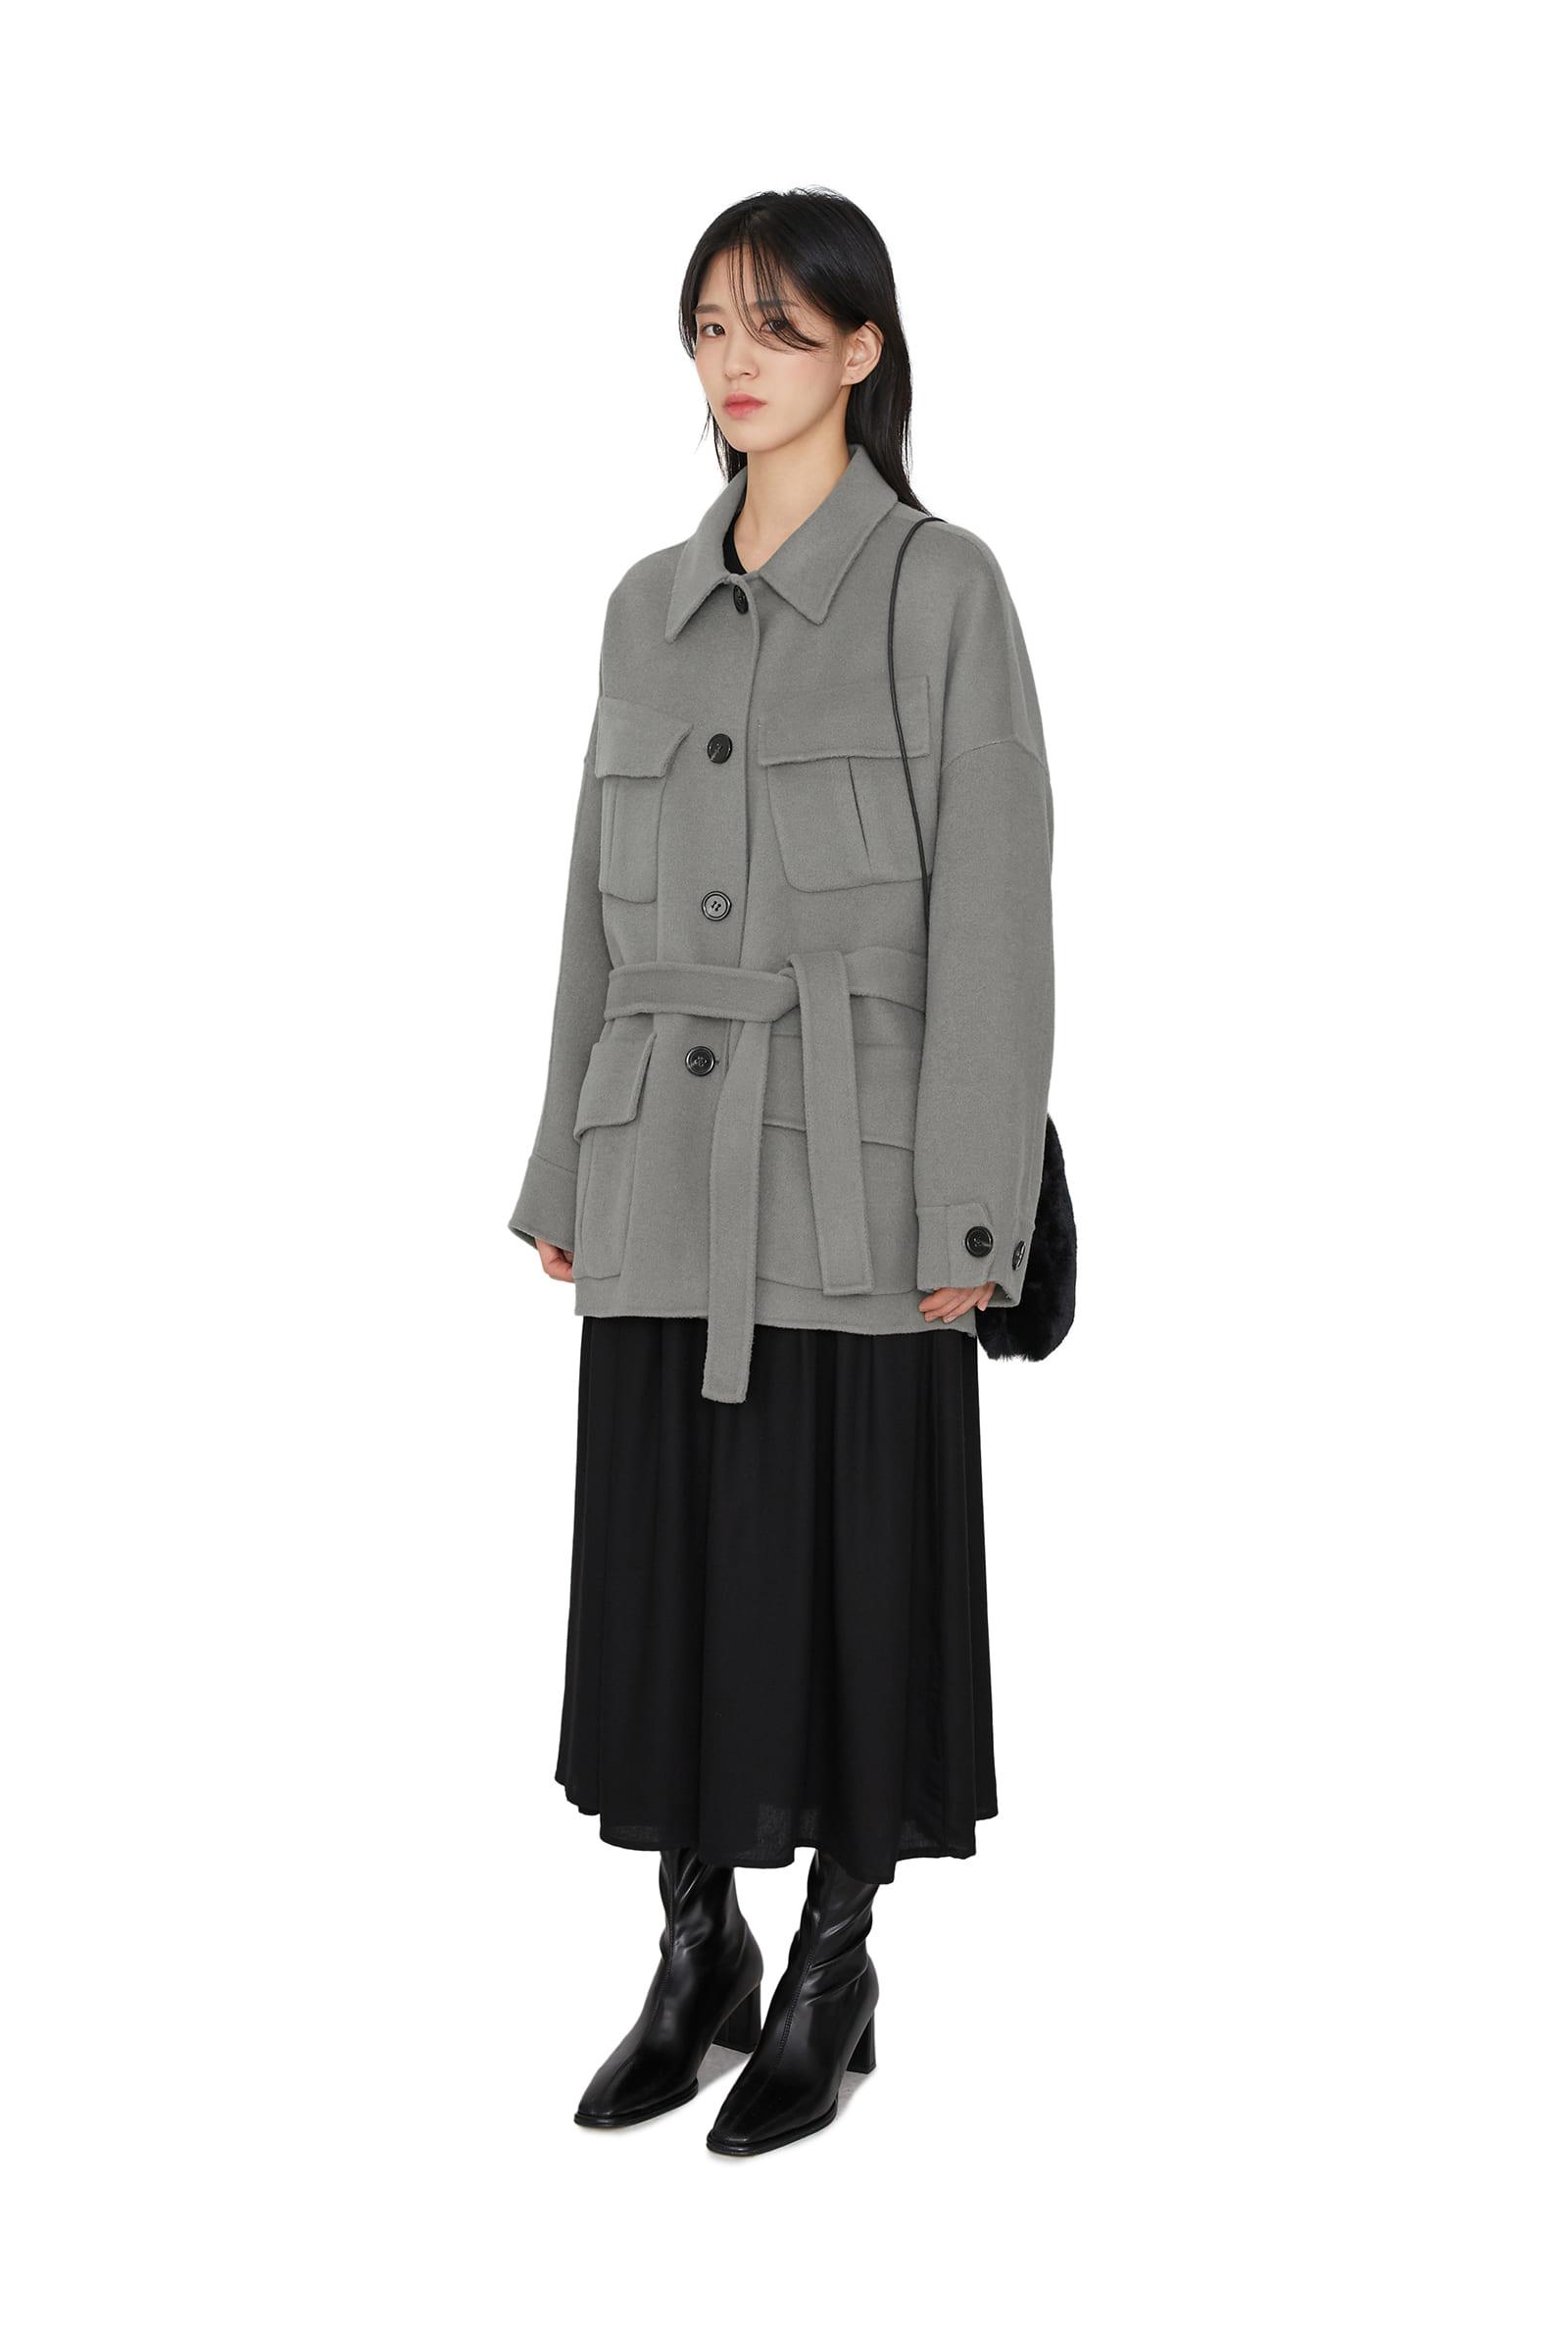 Muse pocket half coat